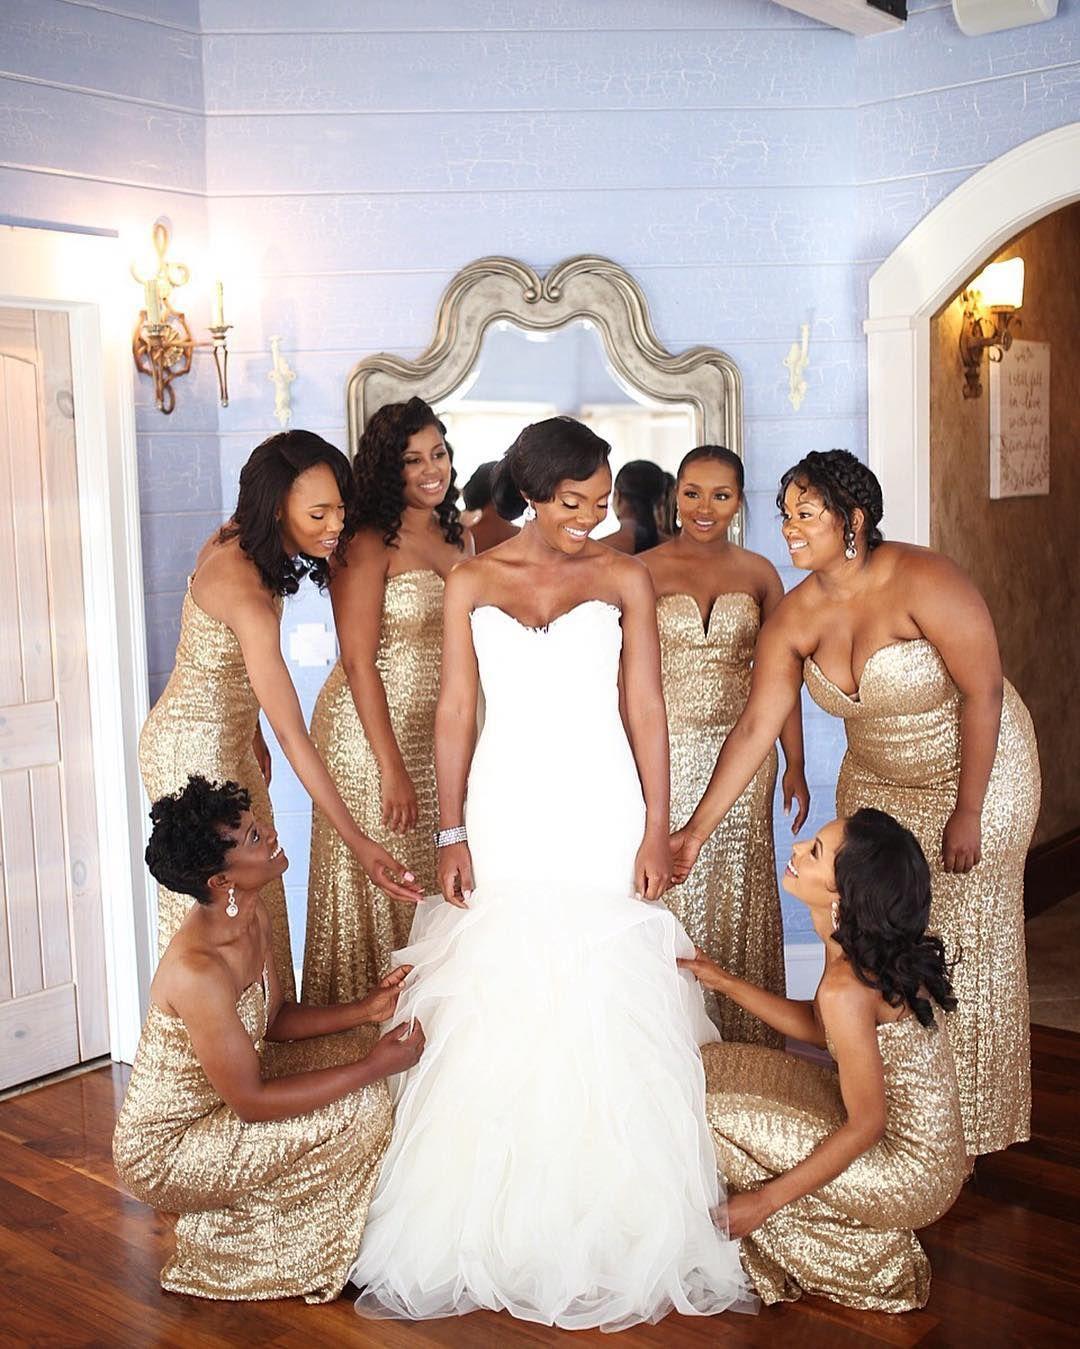 20 Flawless Black Wedding Parties Black Girl With Long Hair Bridesmaid Wedding Wedding Poses [ 1349 x 1080 Pixel ]